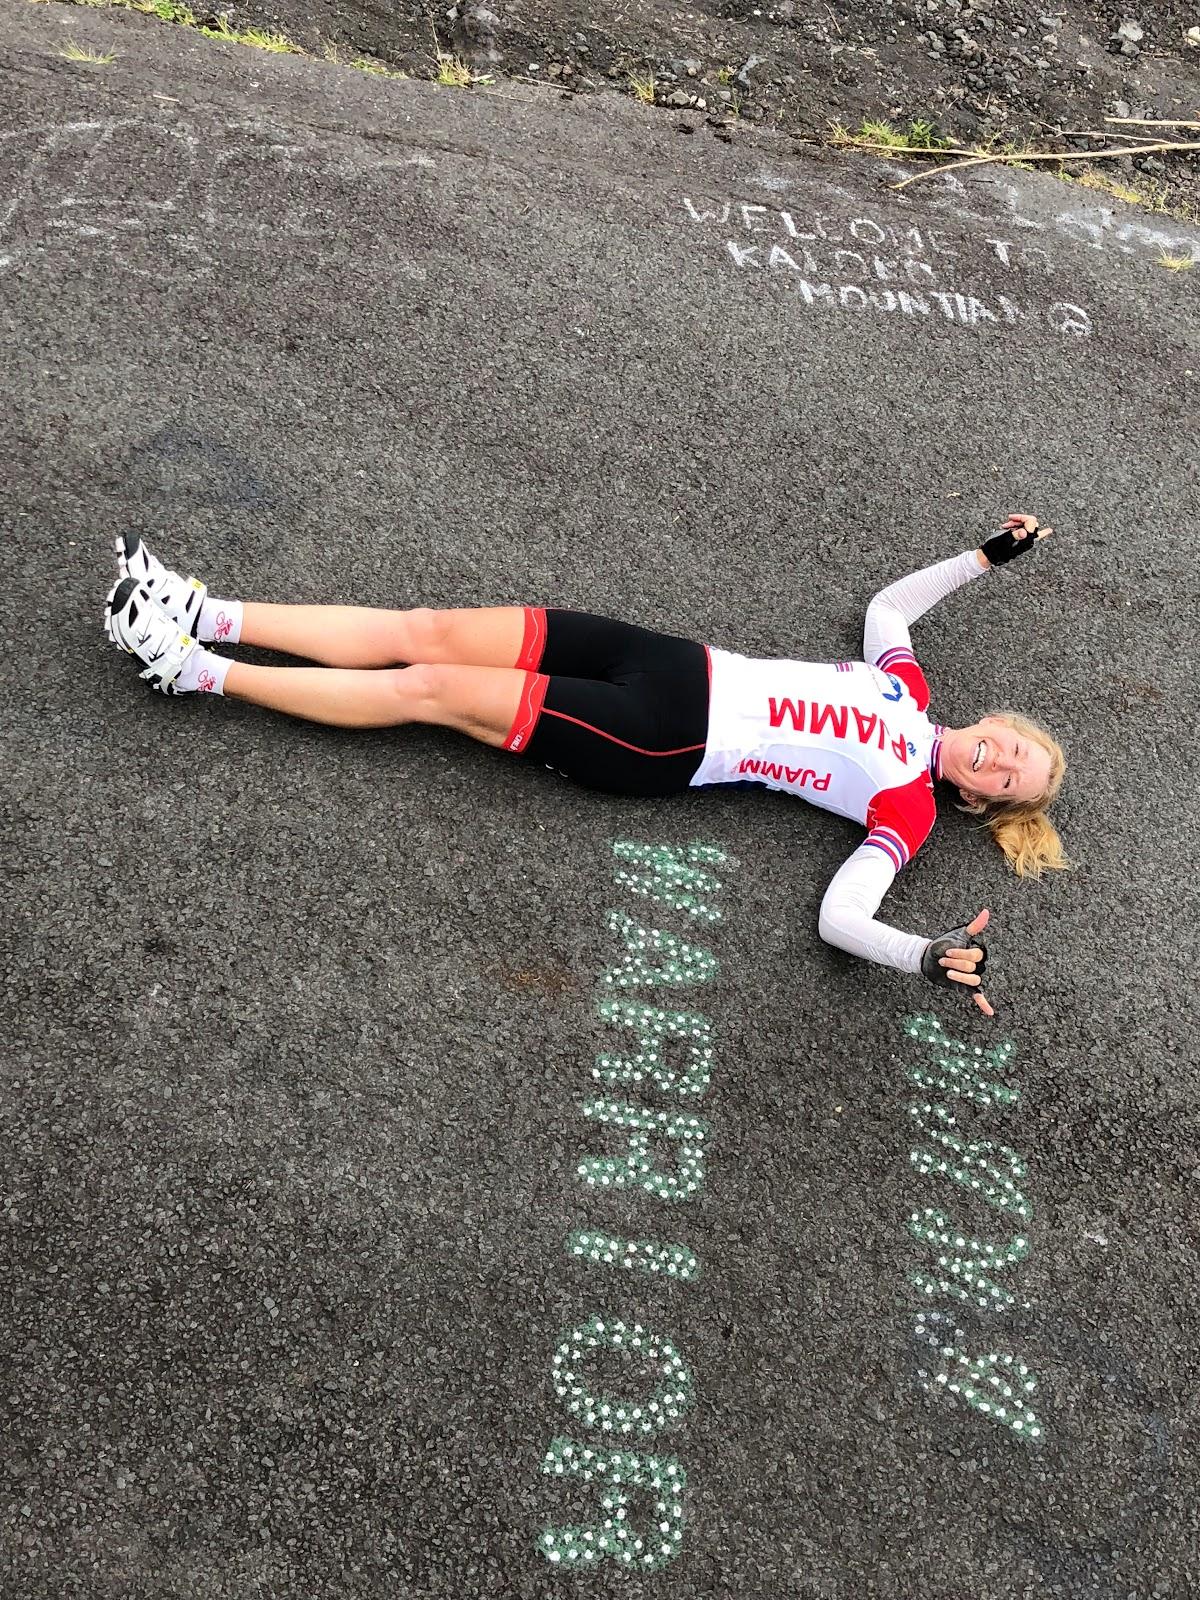 Cyclist on ground next to Mama Warrior roadway sign on Kaloko Drive Hawaii